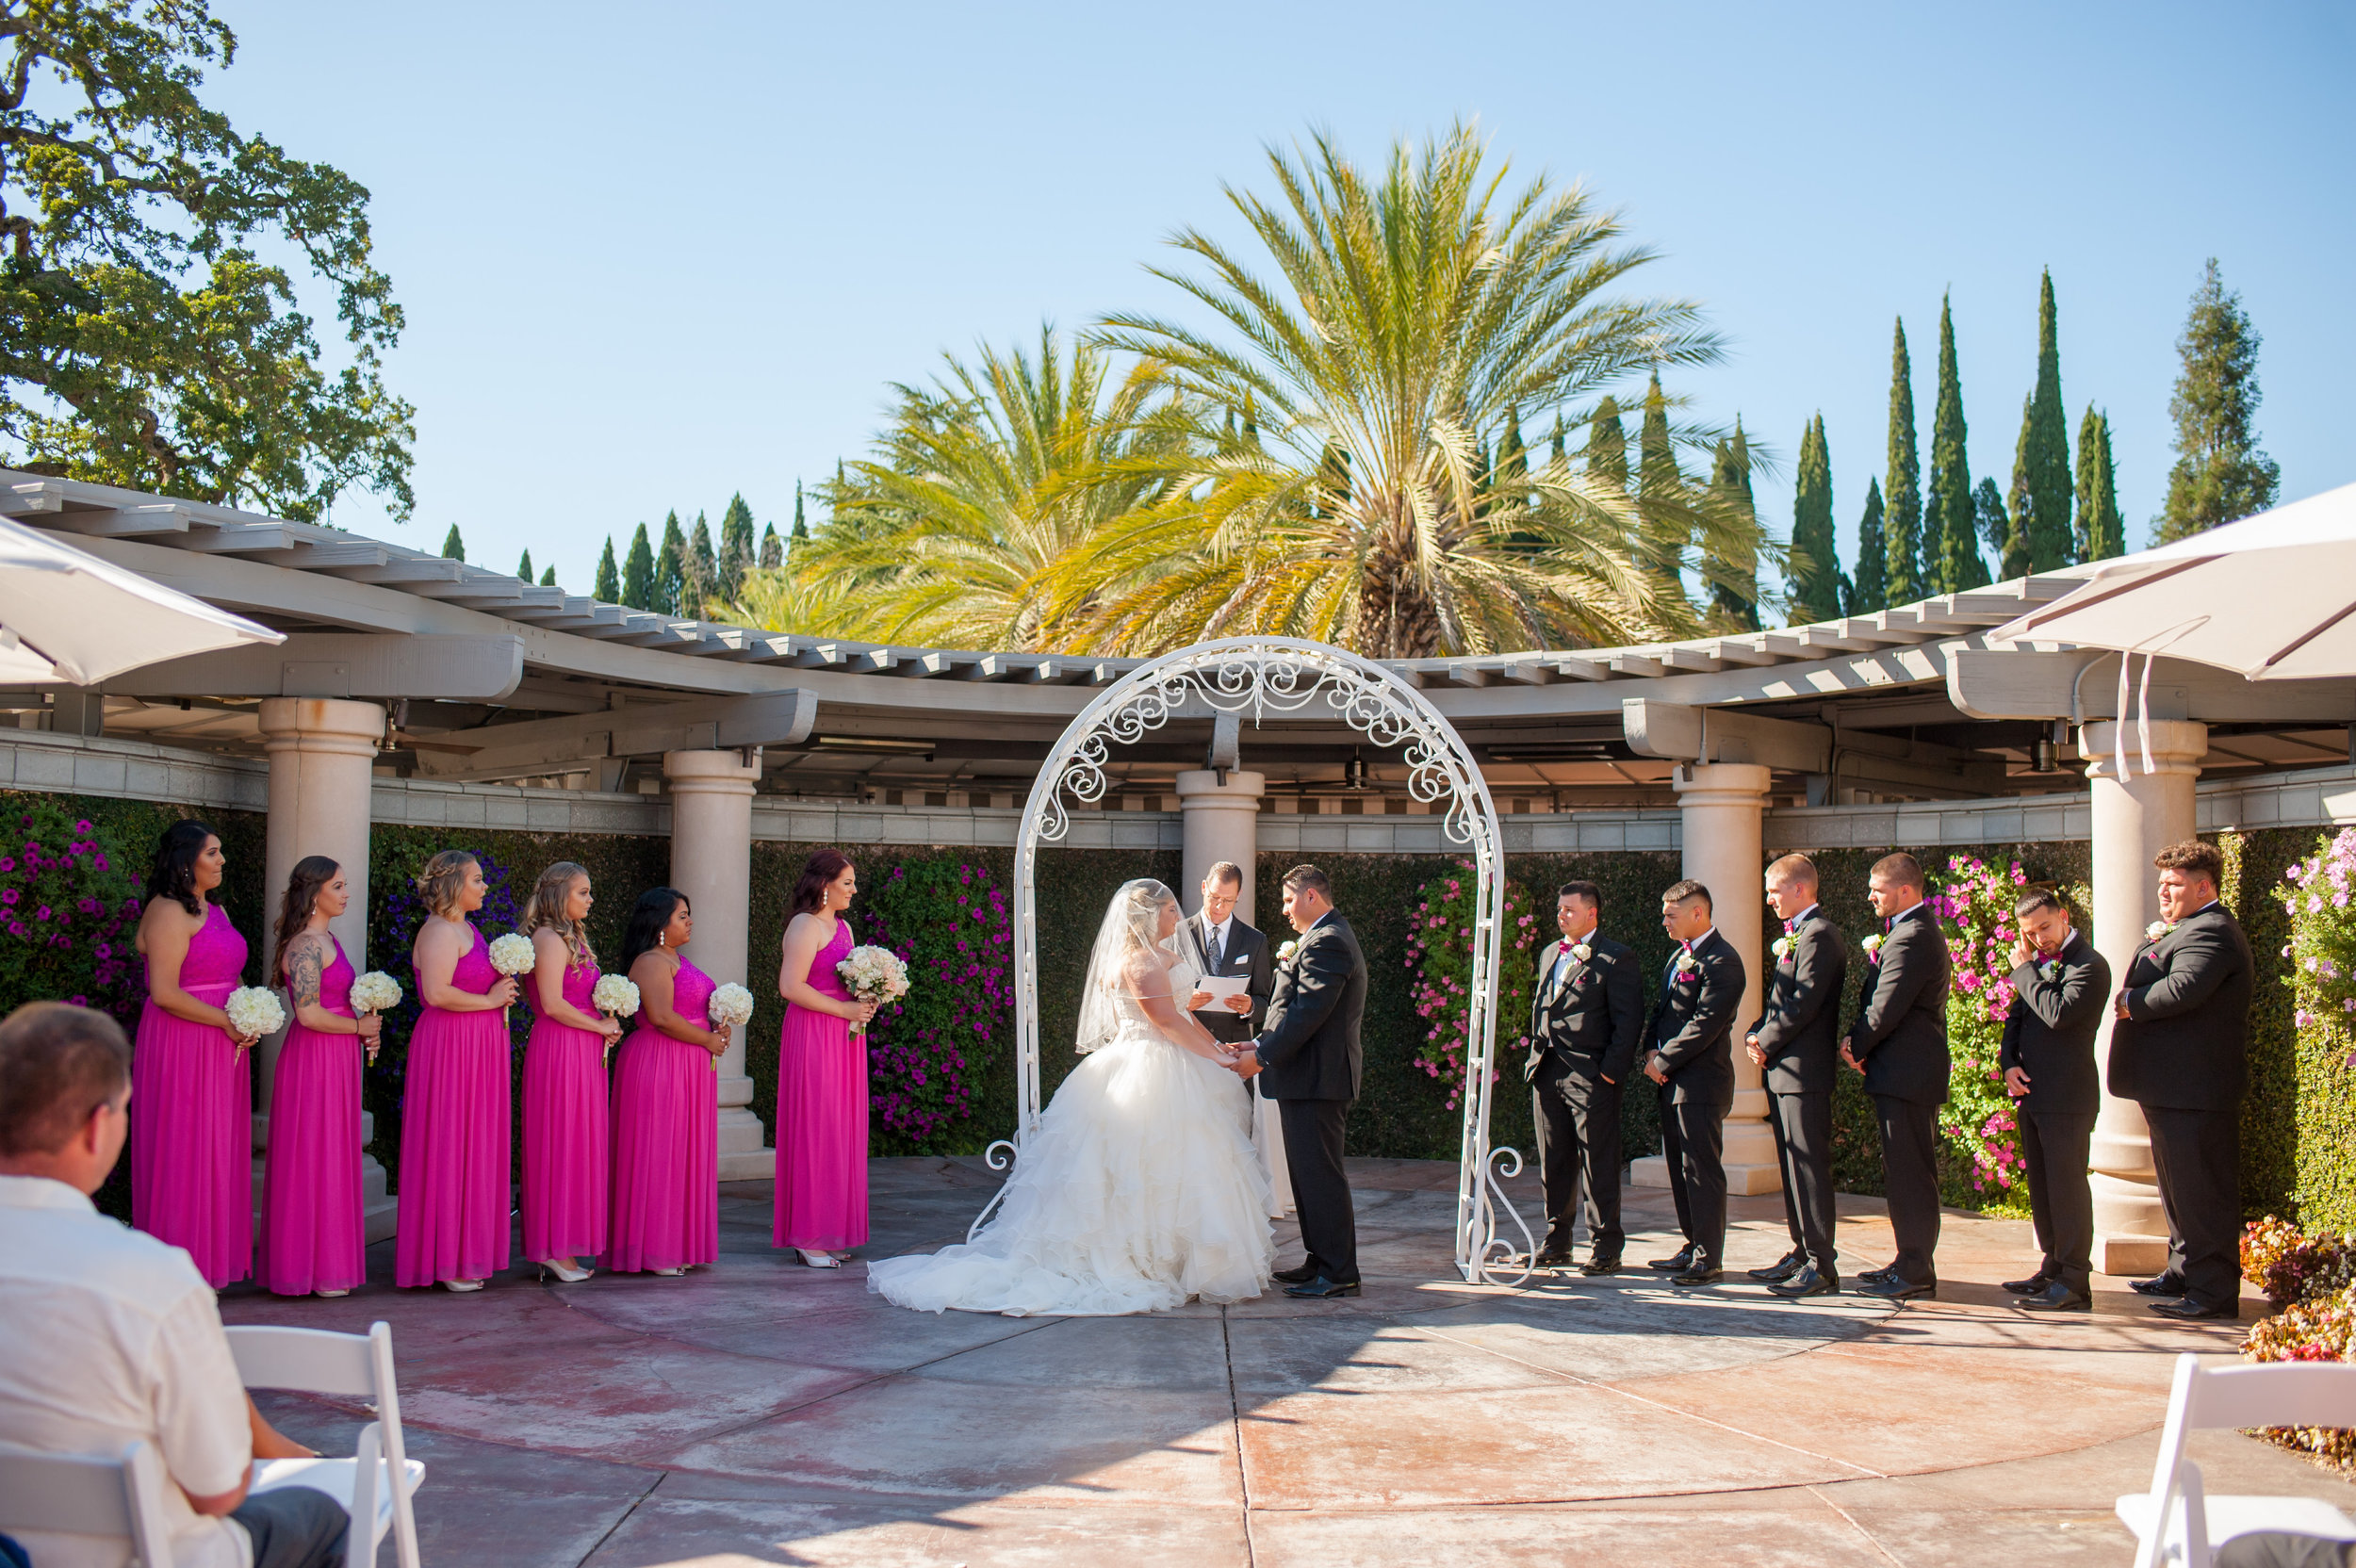 lyndzie-javier-016-arden-hills-sacramento-wedding-photographer-katherine-nicole-photography.JPG